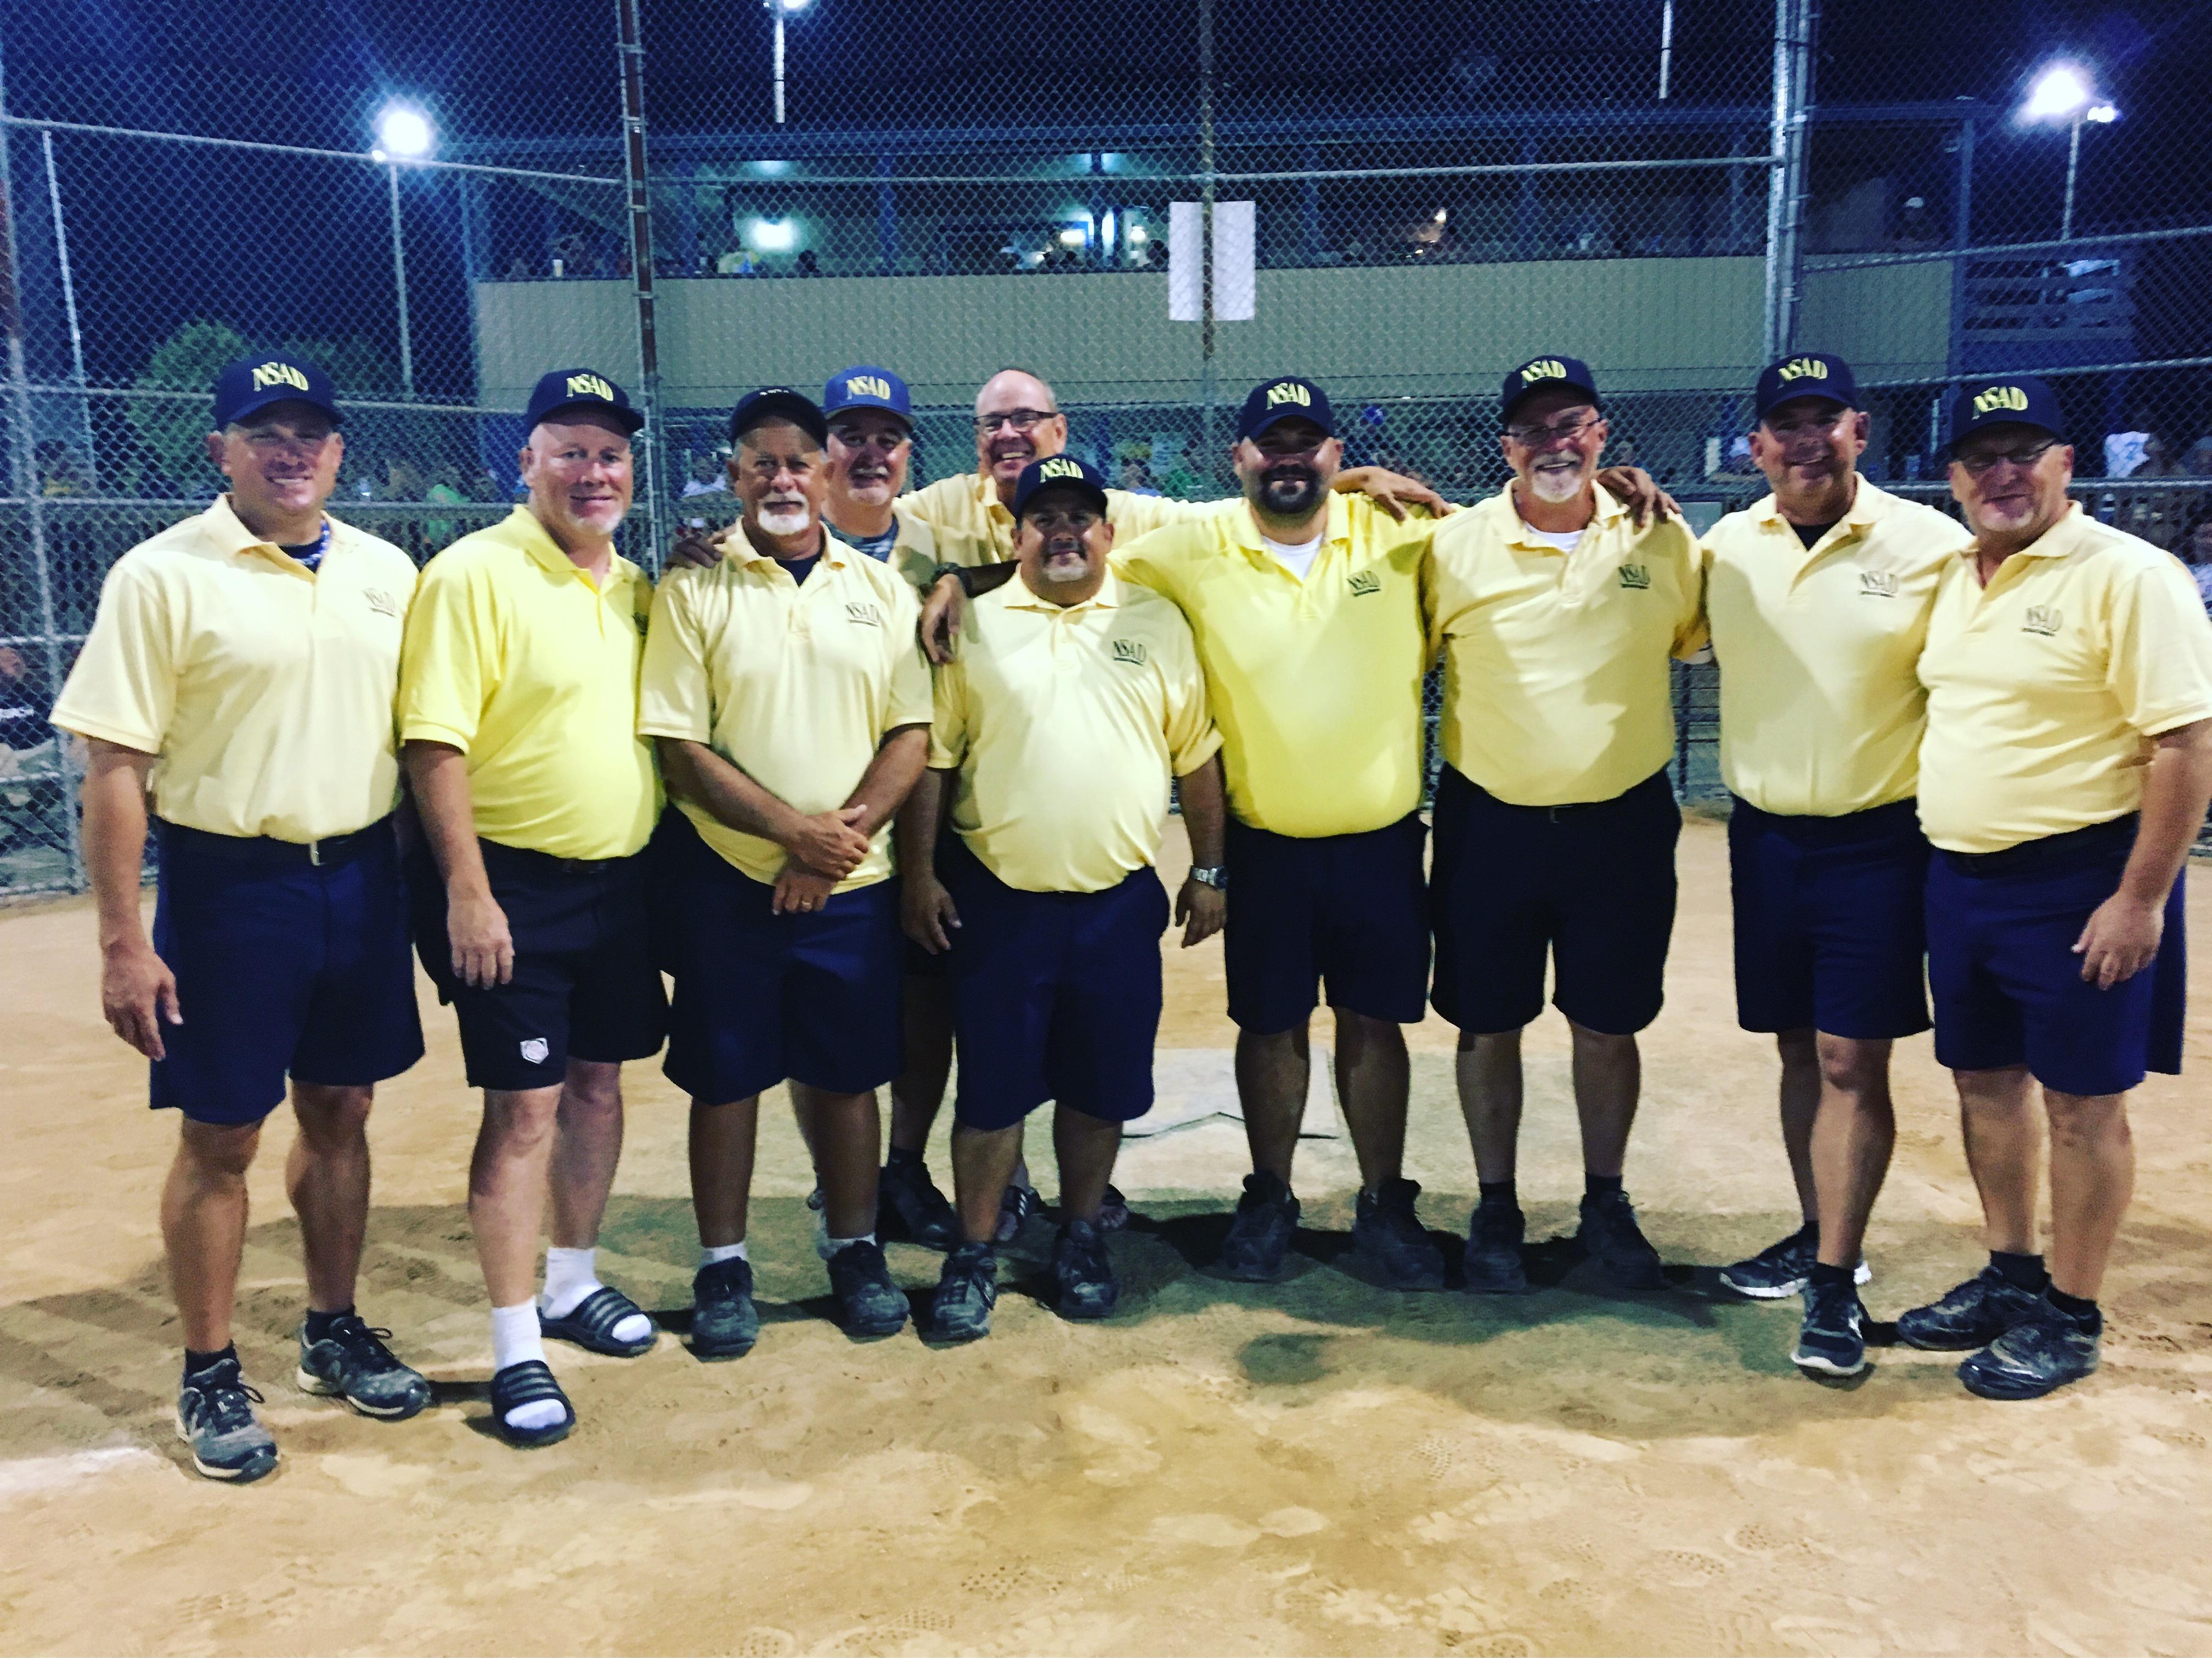 2016 NSAD Umpires